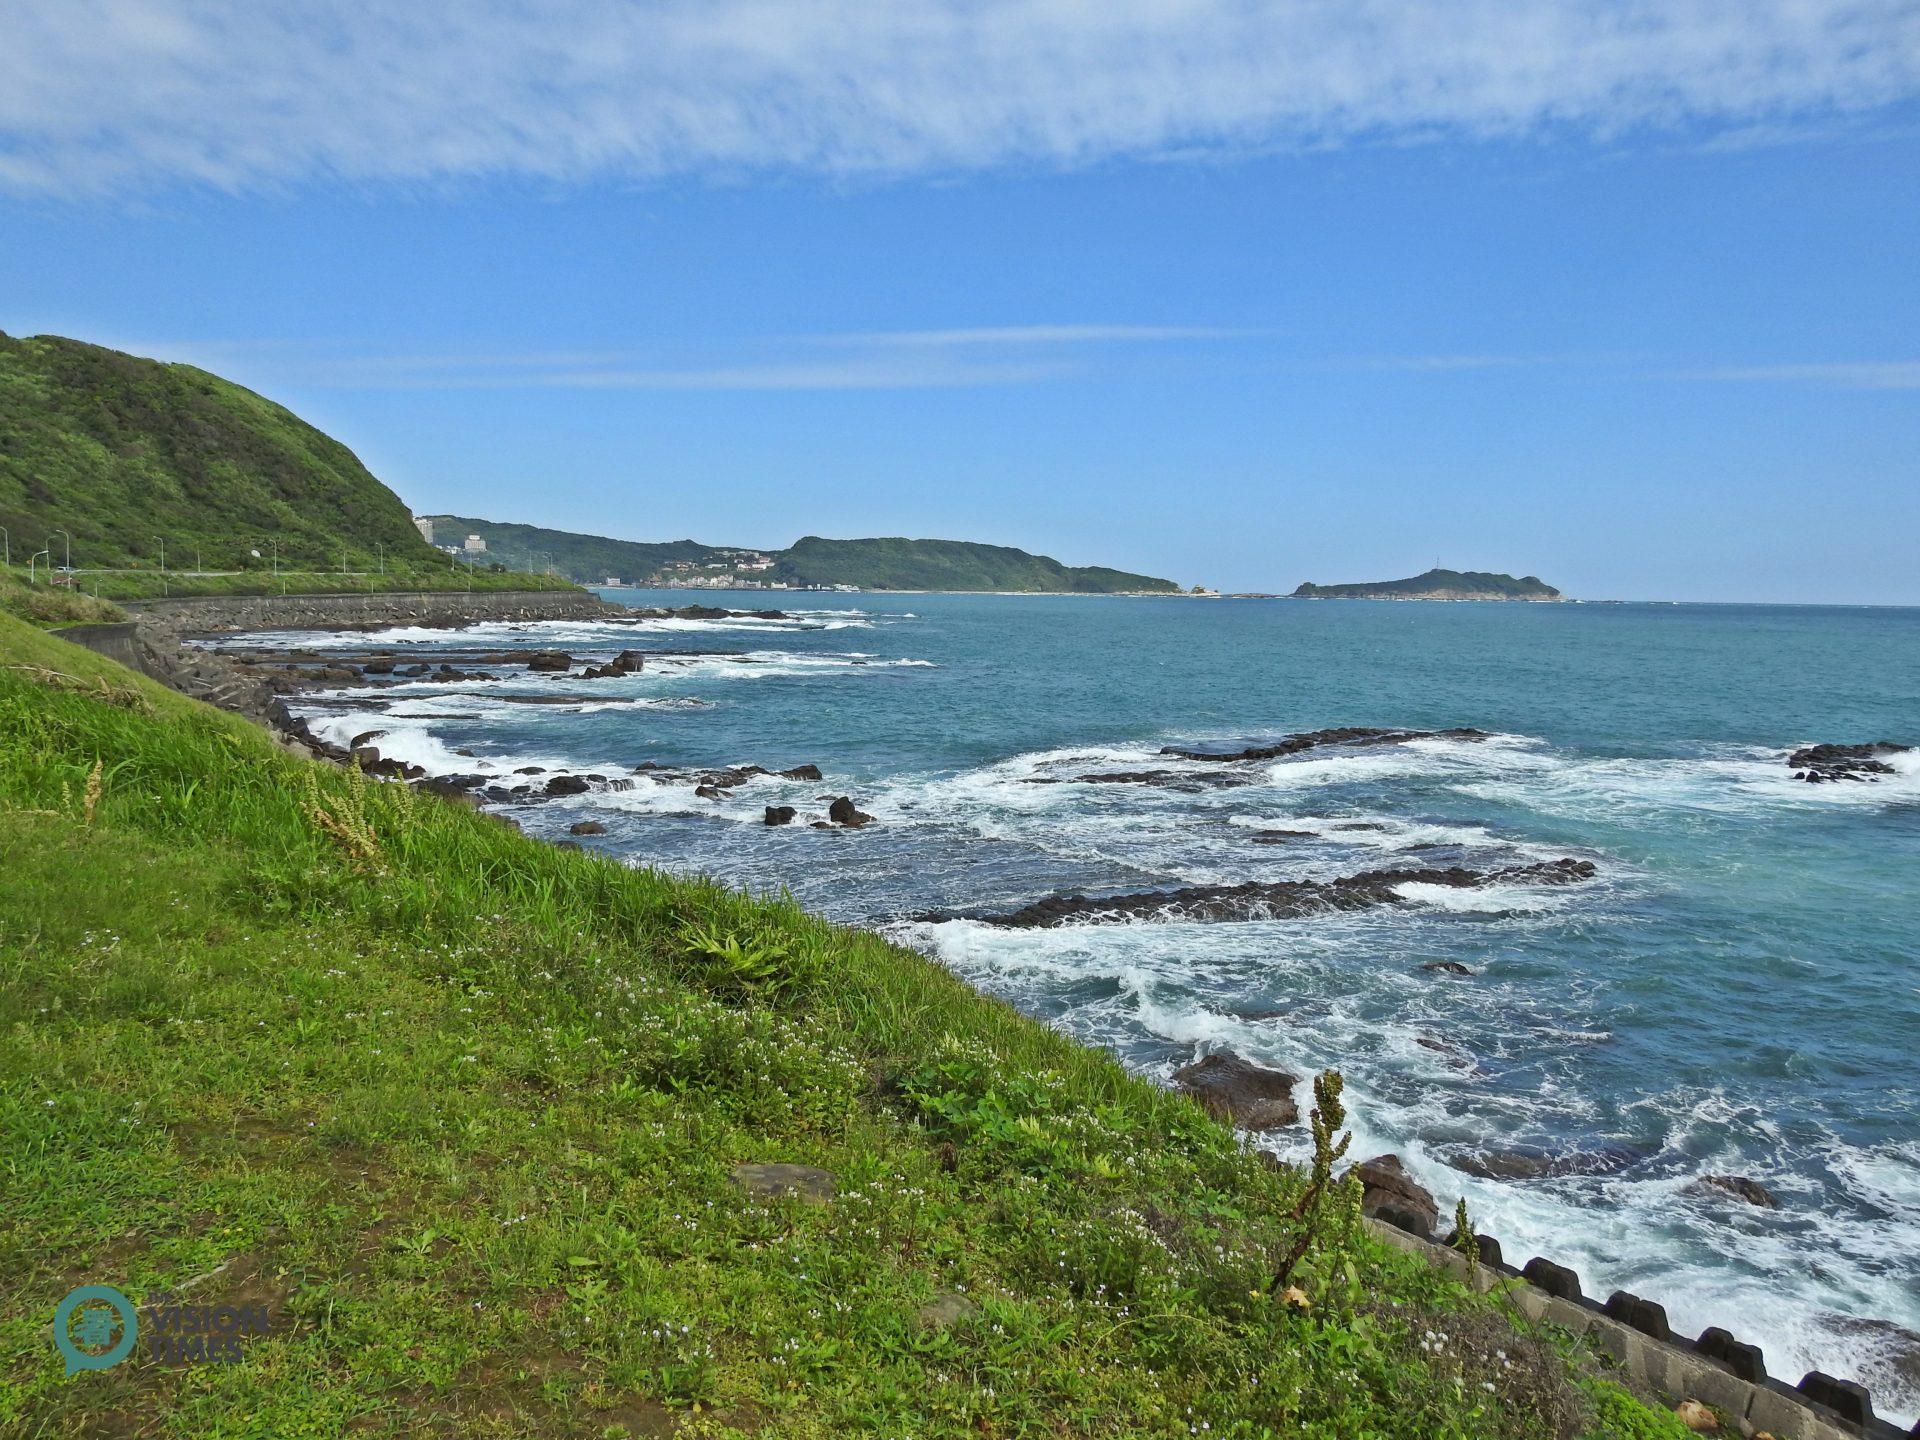 The Wanli section of Taiwan's beautiful north coast. (Image: Billy Shyu / Vision Times)